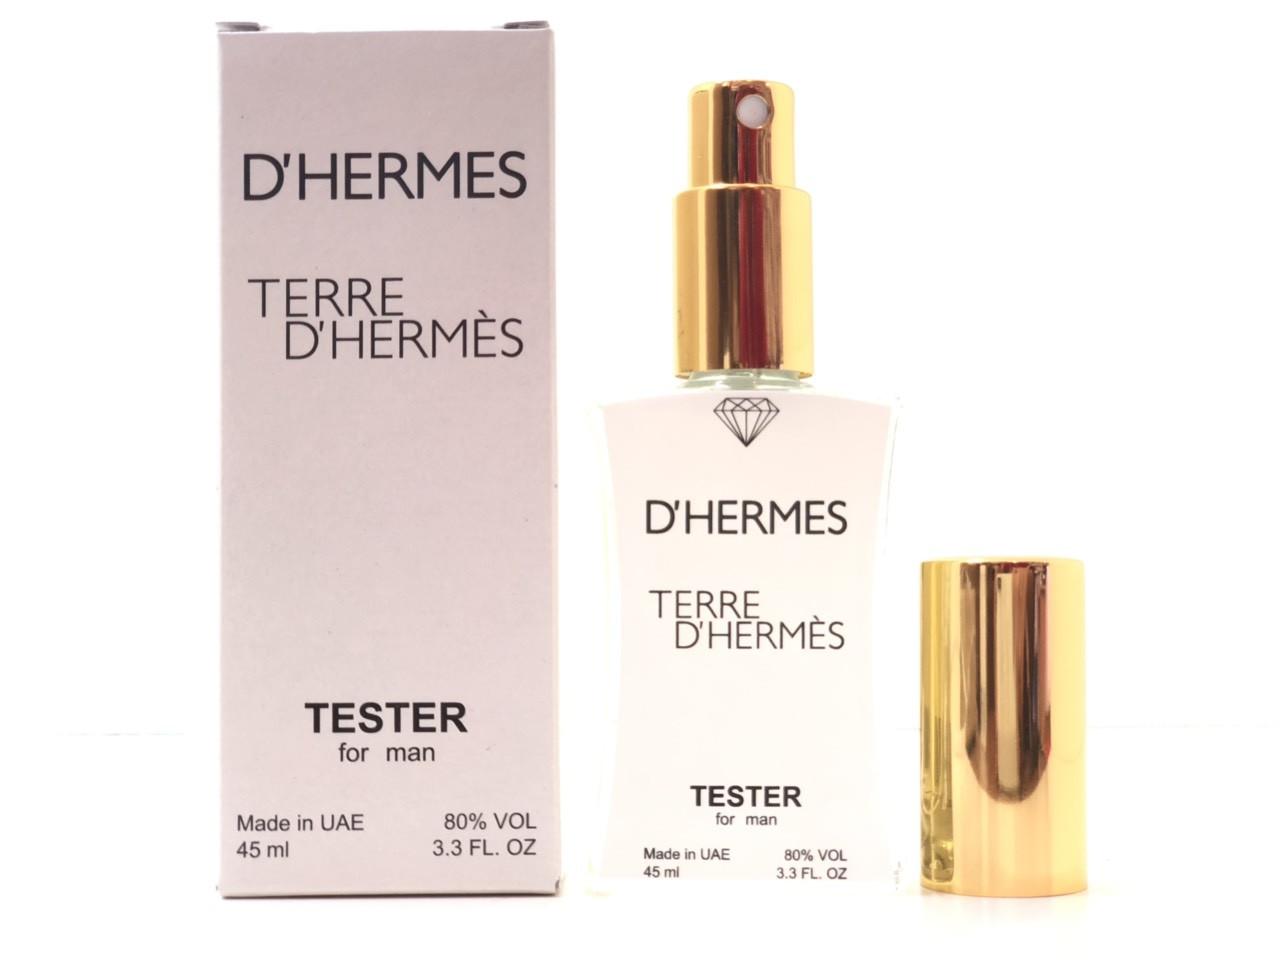 Мужской парфюм Hermes Terre D`Hermes (Гермес Терре Гермес) 45 мл Diamond - реплика